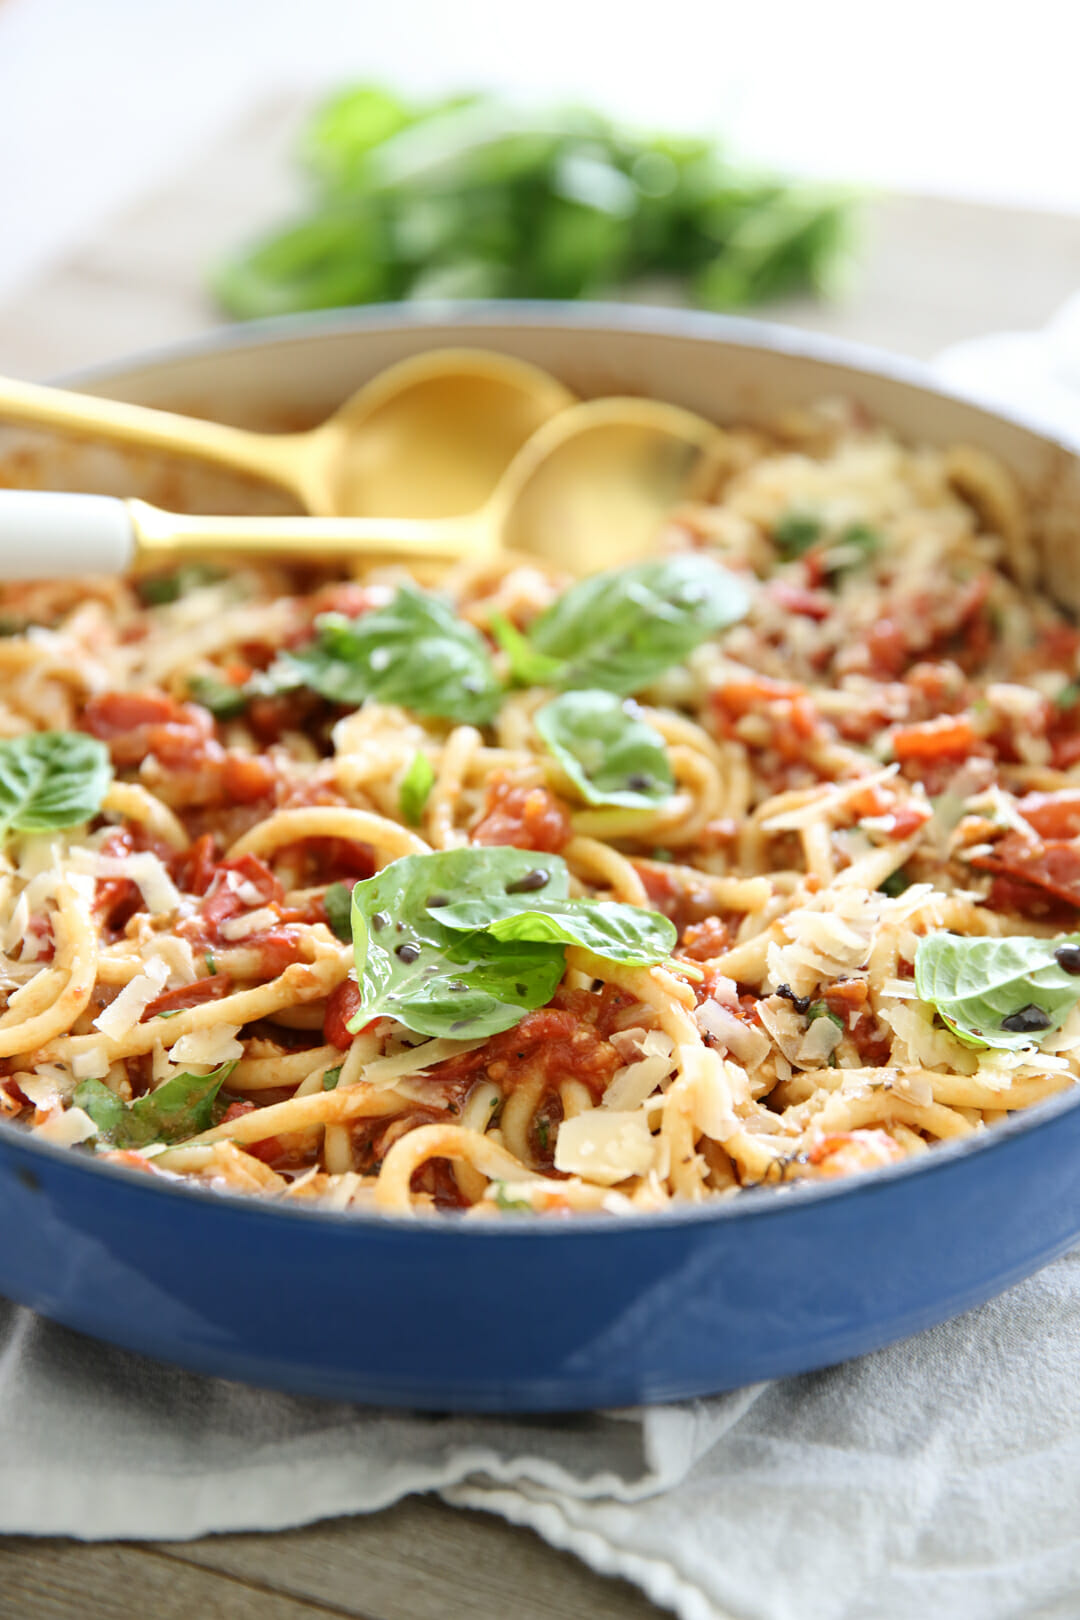 Tomato Basil Pasta in Pan